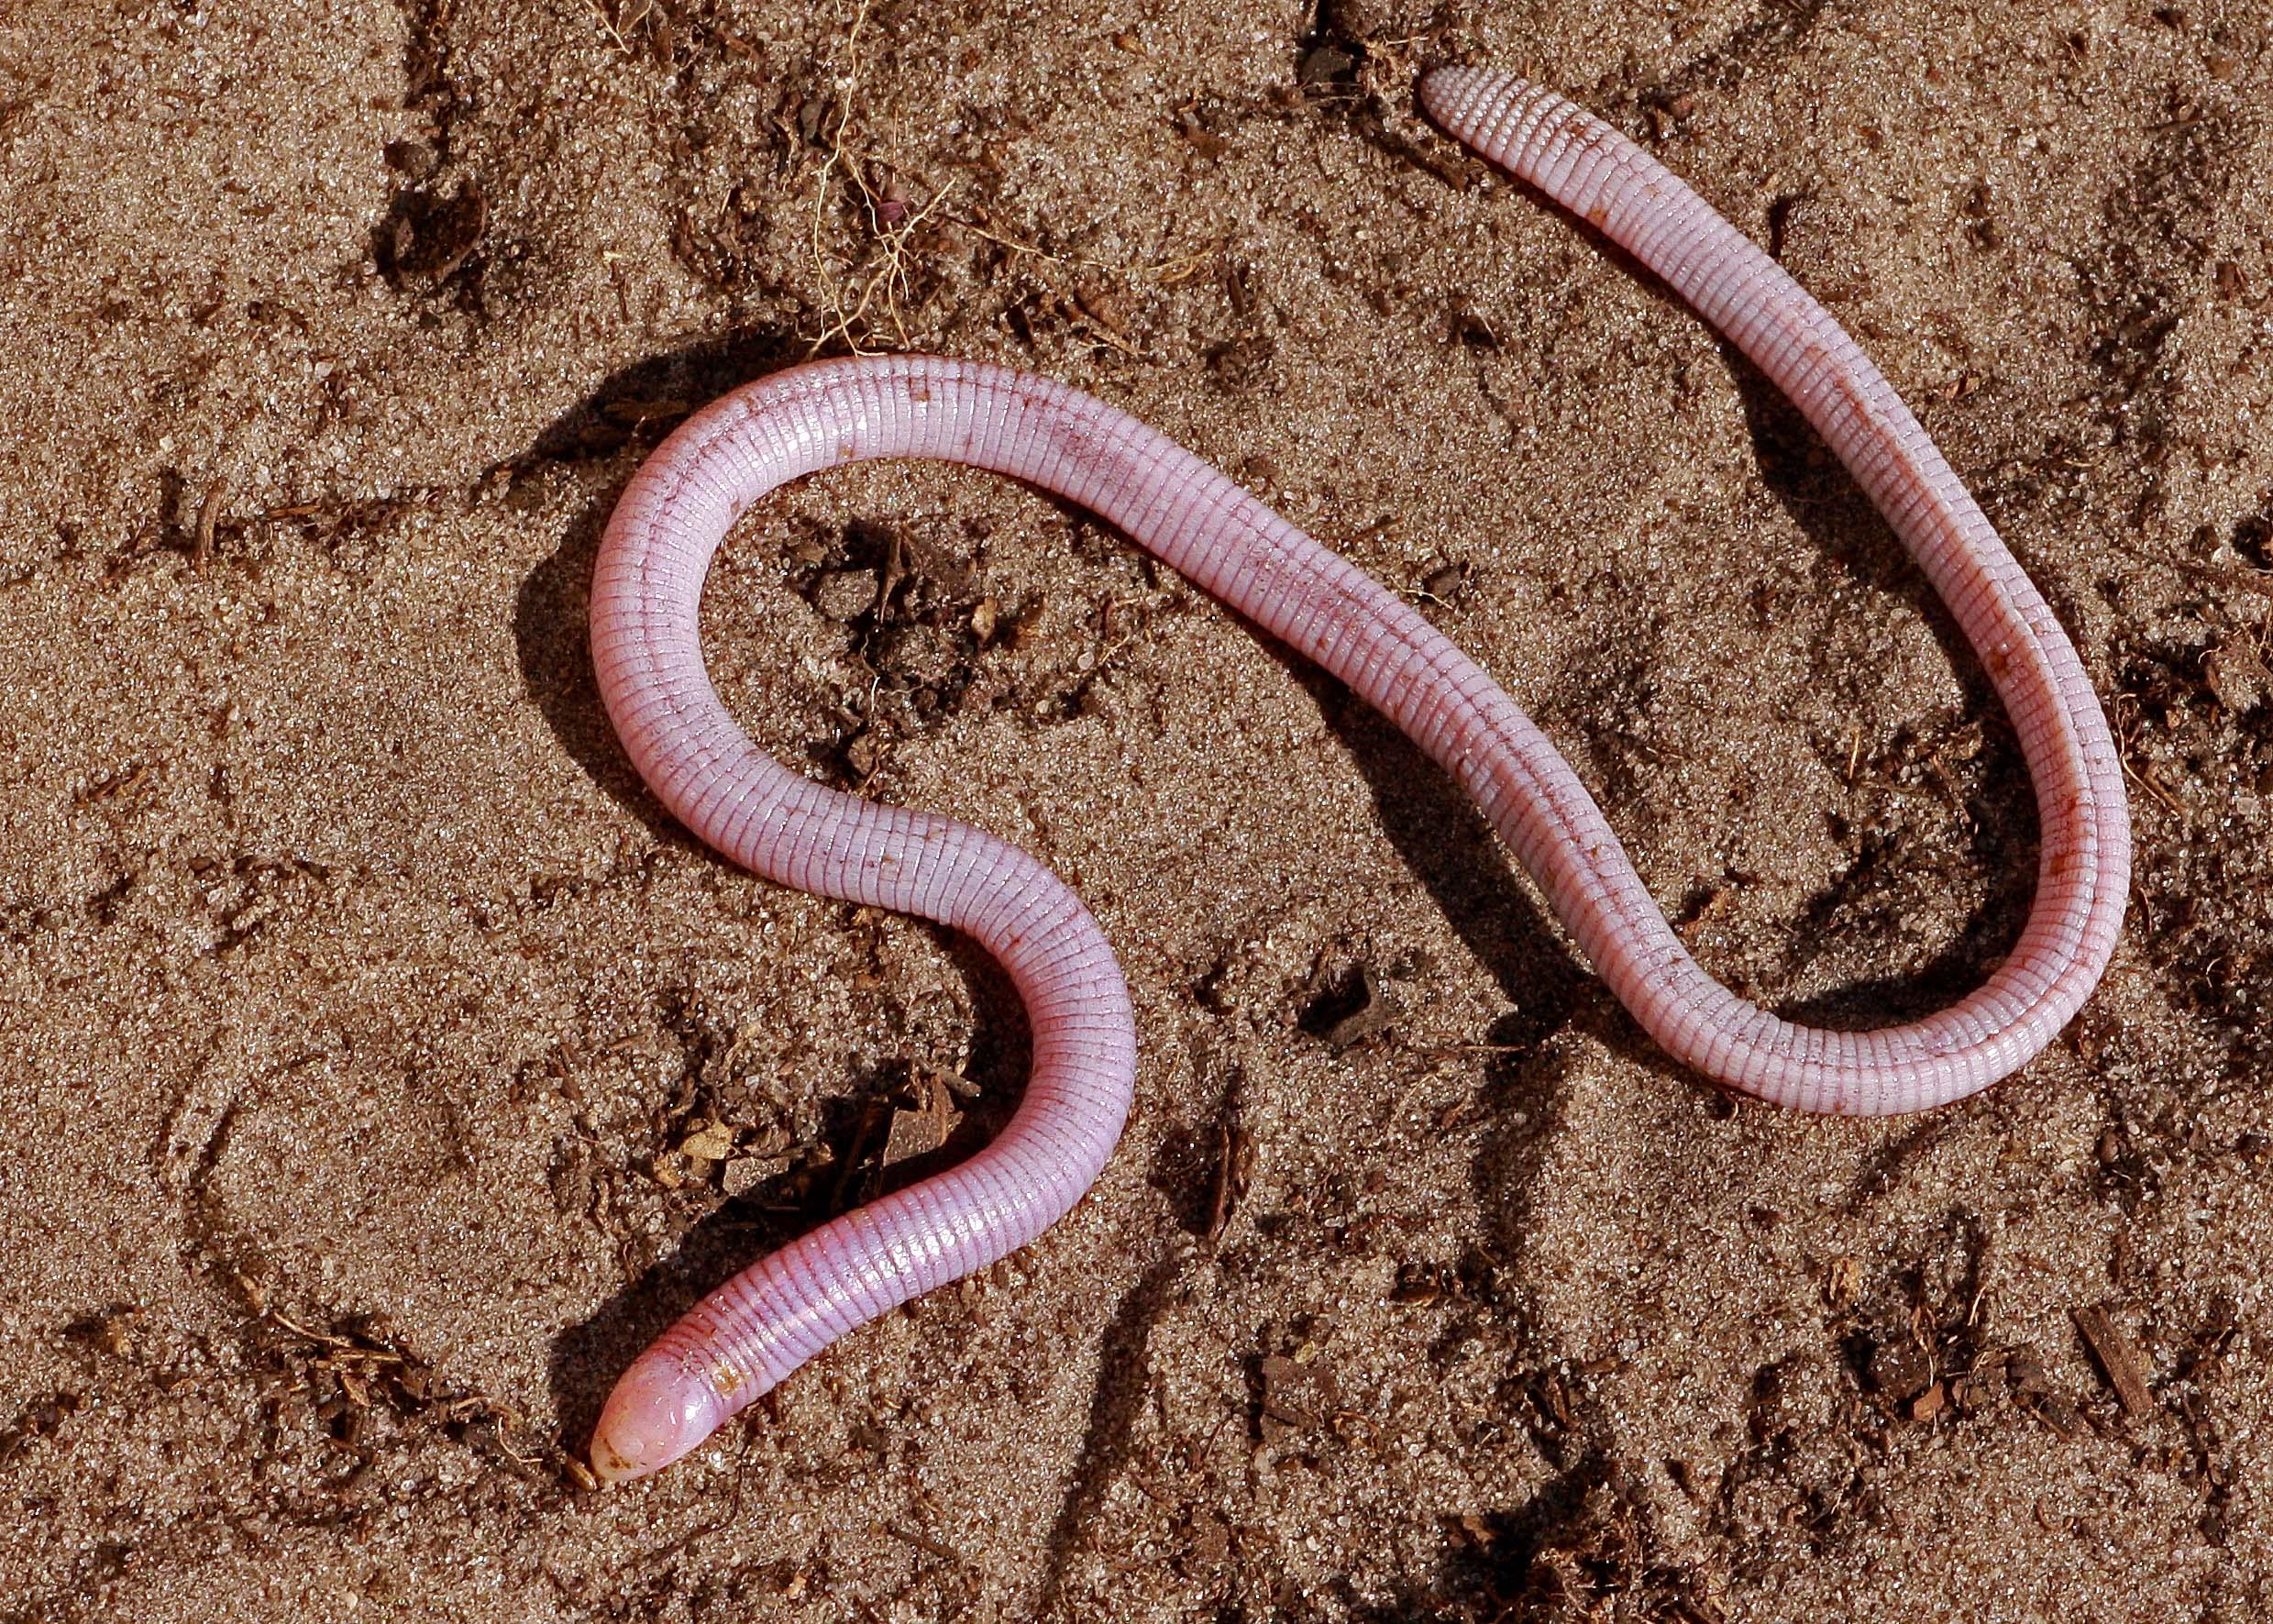 Florida worm lizard